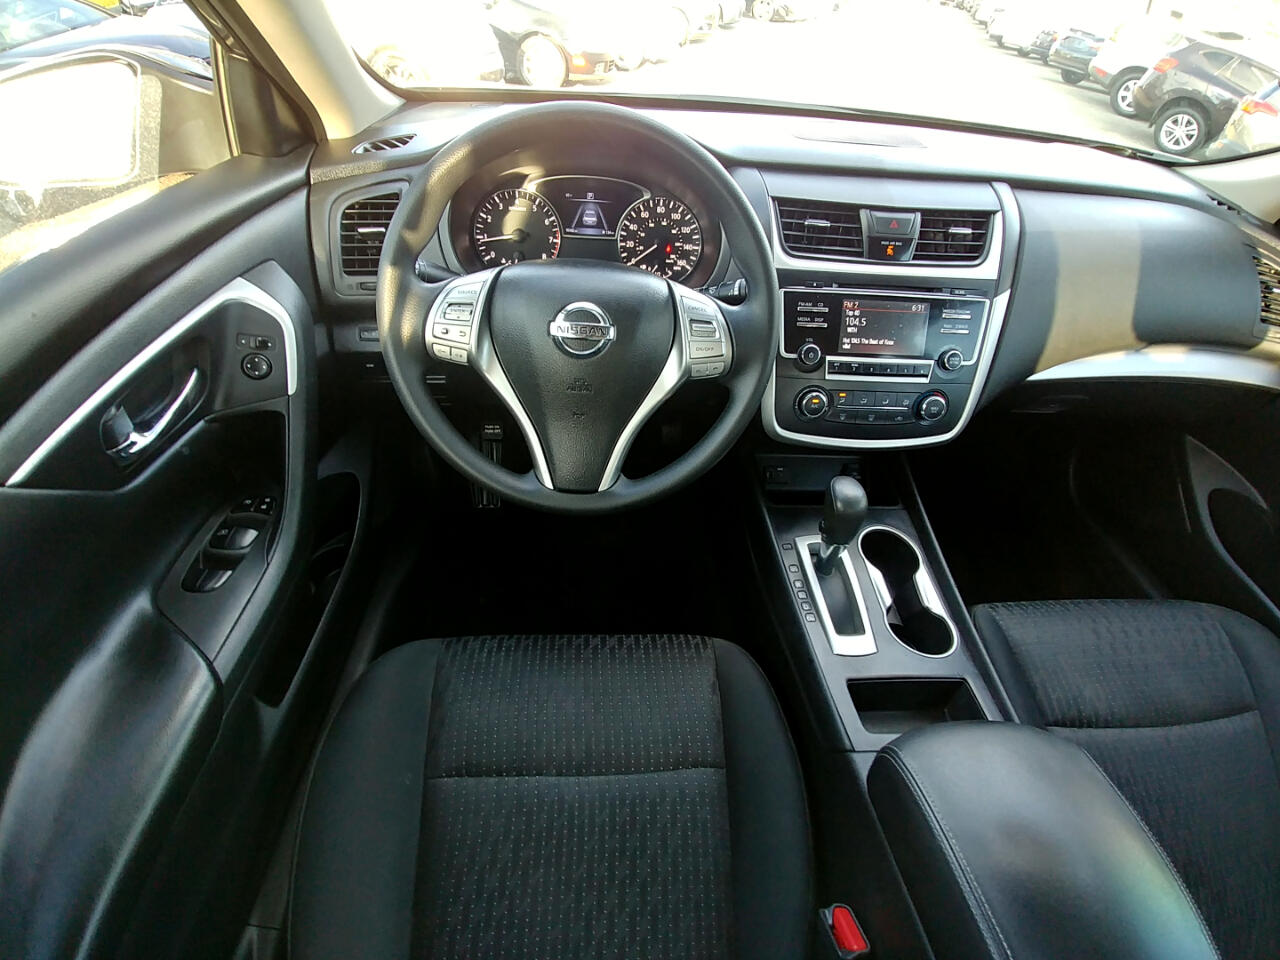 2016 Nissan Altima 4dr Sdn I4 2.5